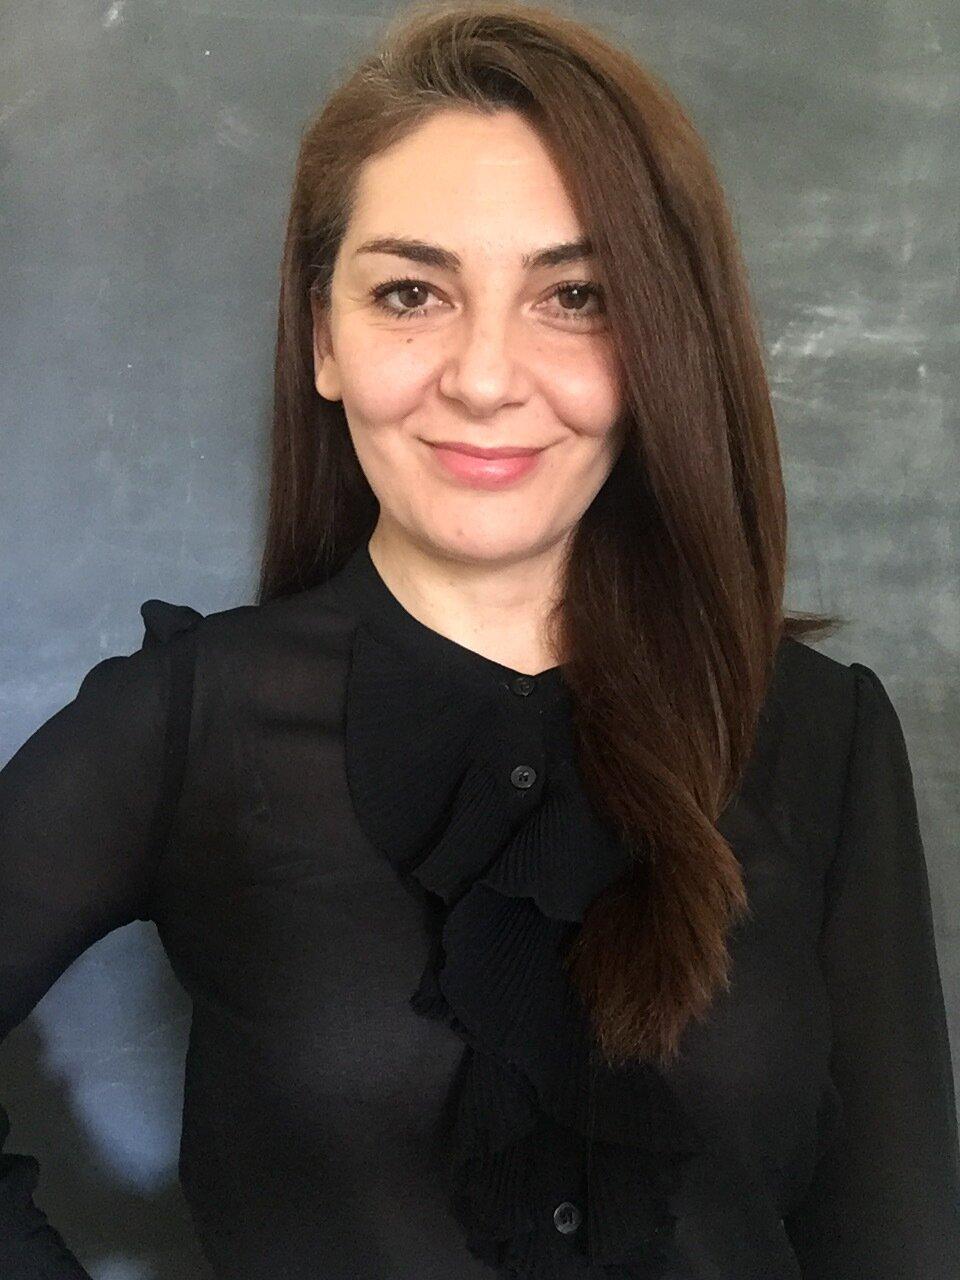 Sophie Halliday Zadeh, Body Language Specialist, My Alcomy. Body Language Coach, Trainer and Keynote Speaker